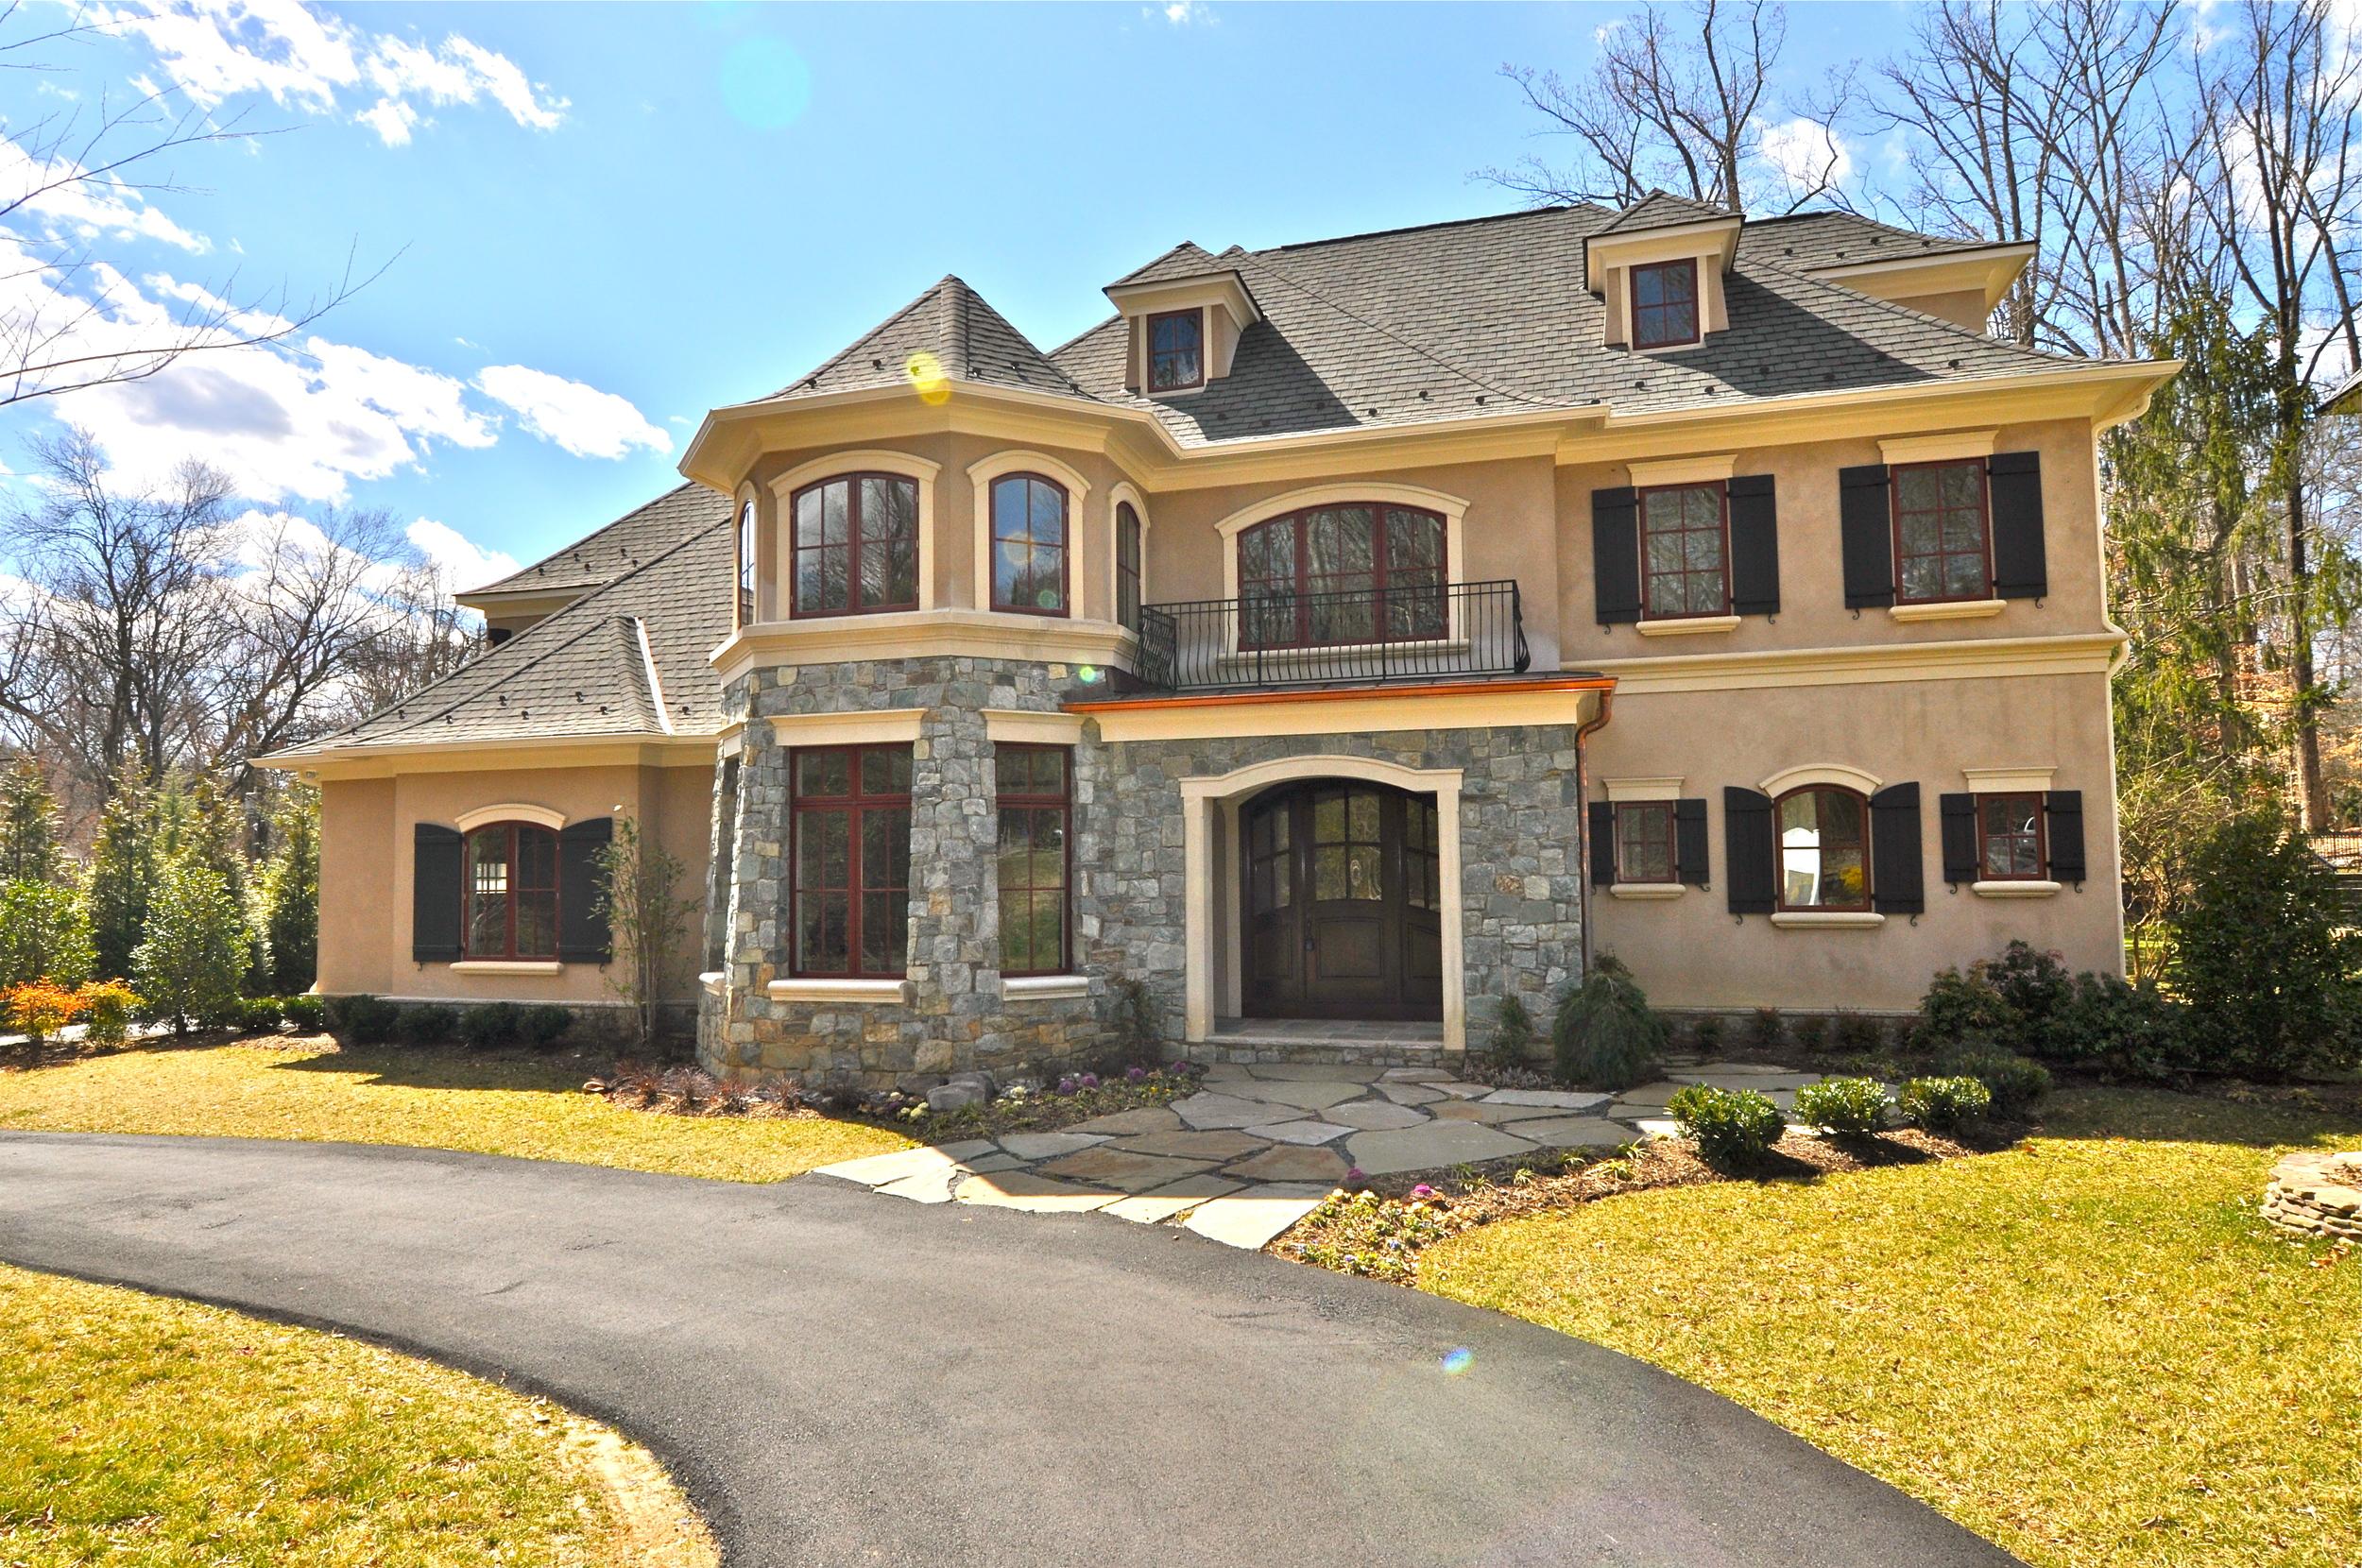 Sold Listing - Bethesda, MD